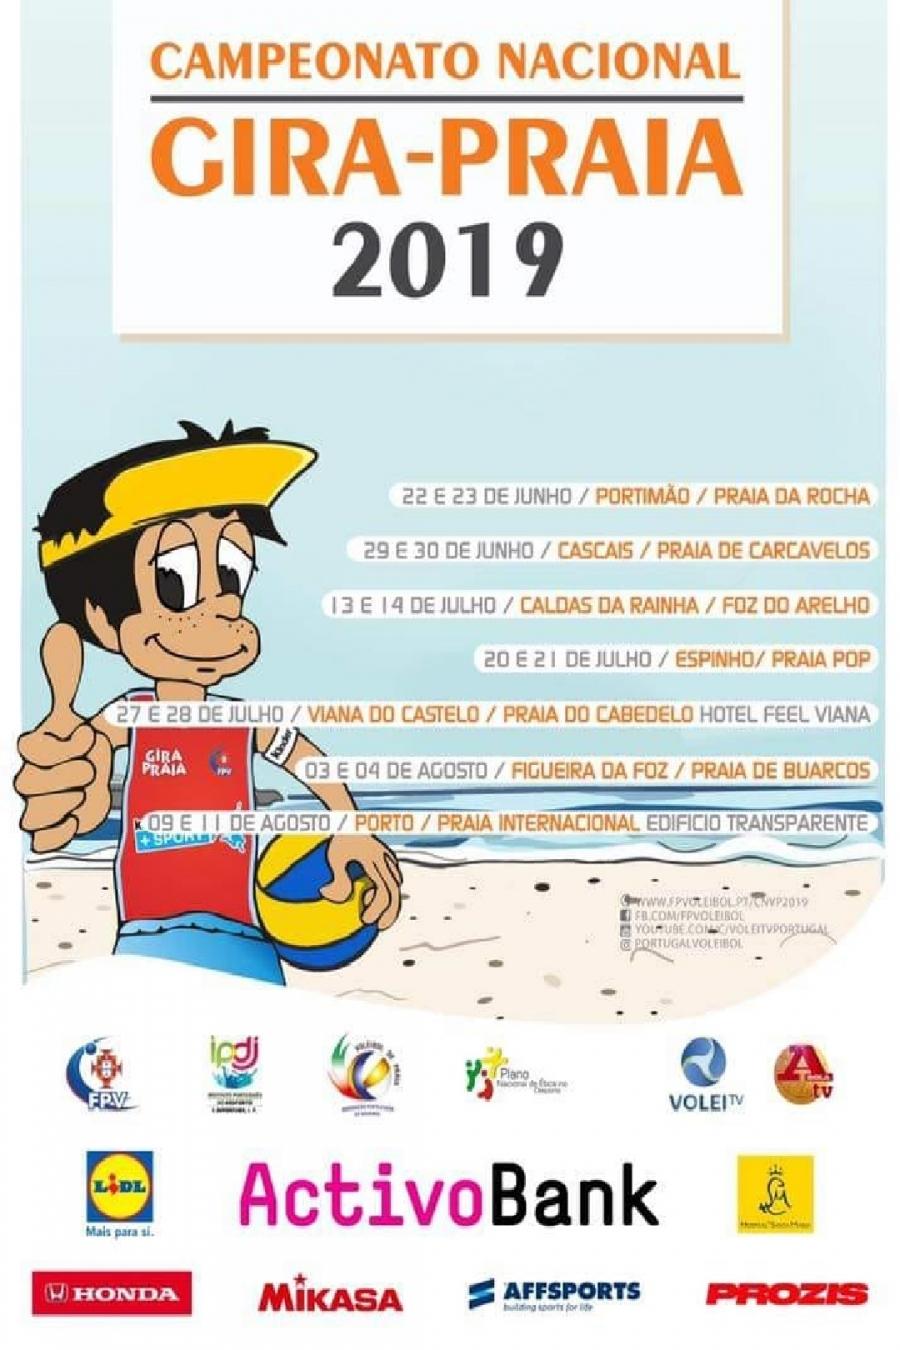 Campeonato Nacional Gira-Praia na Foz do Arelho